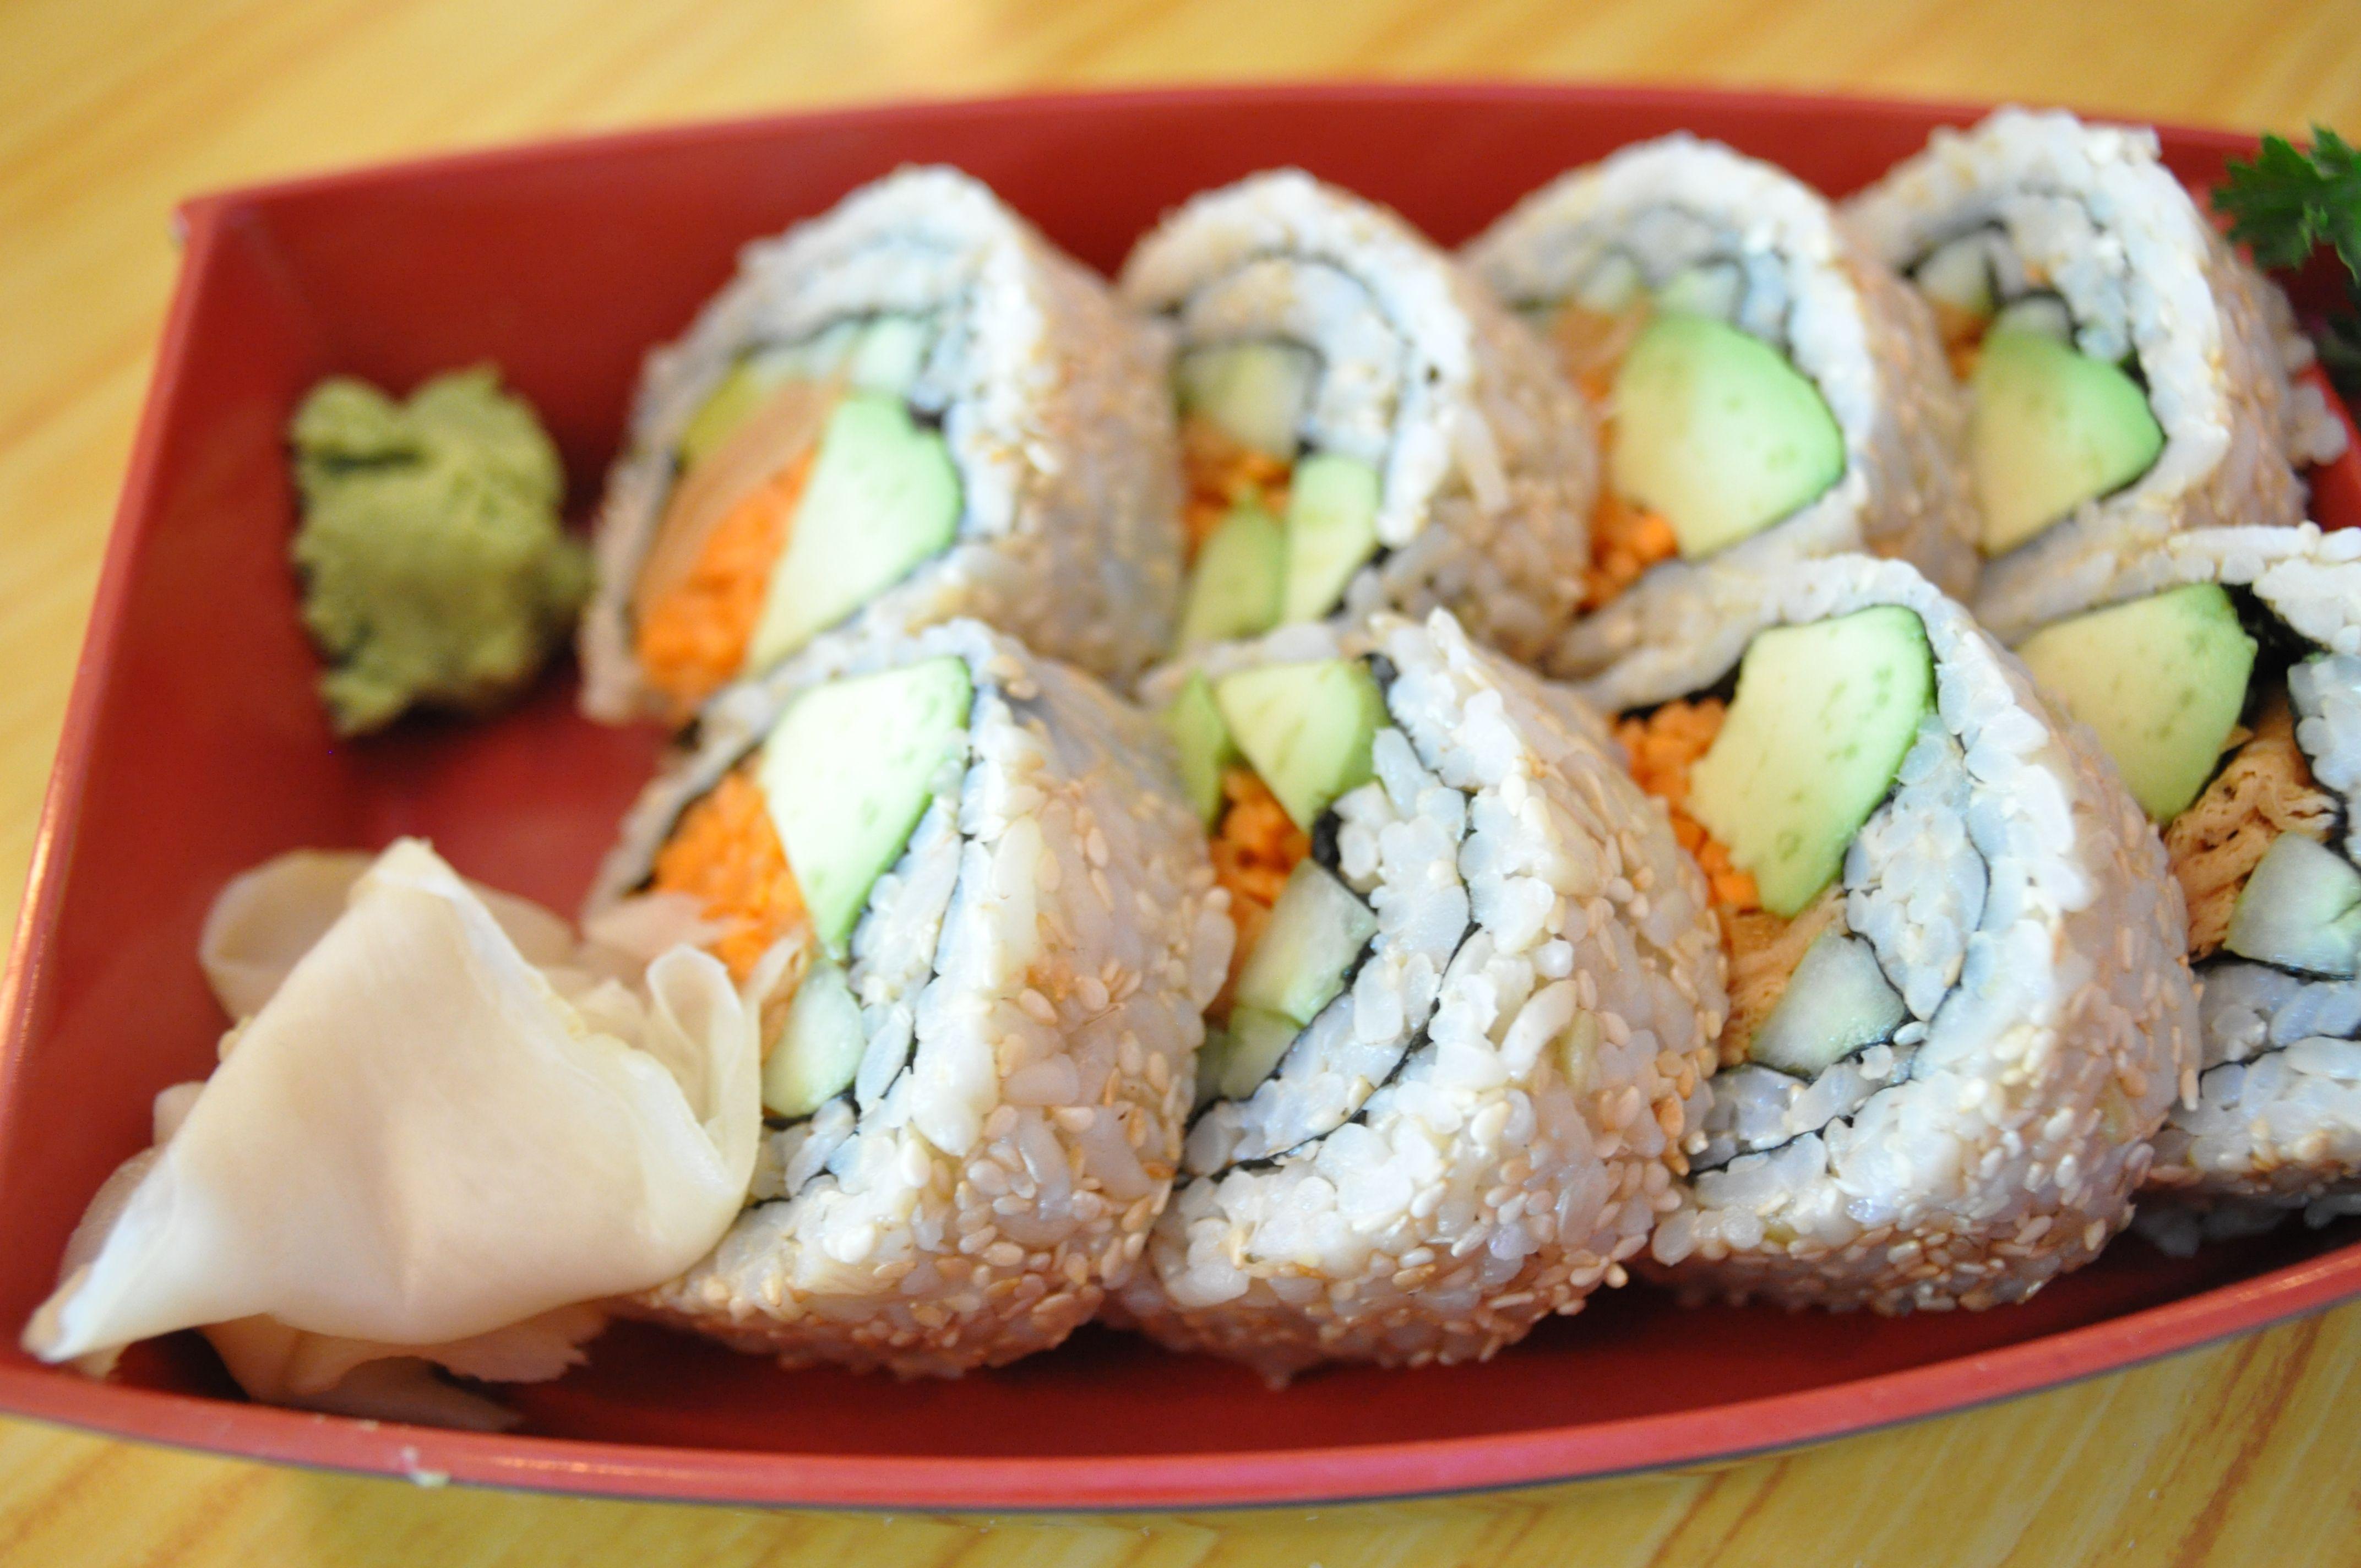 Yummy And Healthy Vegan Futomaki Rolls From Vegetable Garden Silver Spring Md Restaurant Healthy Vegan Food Yummy